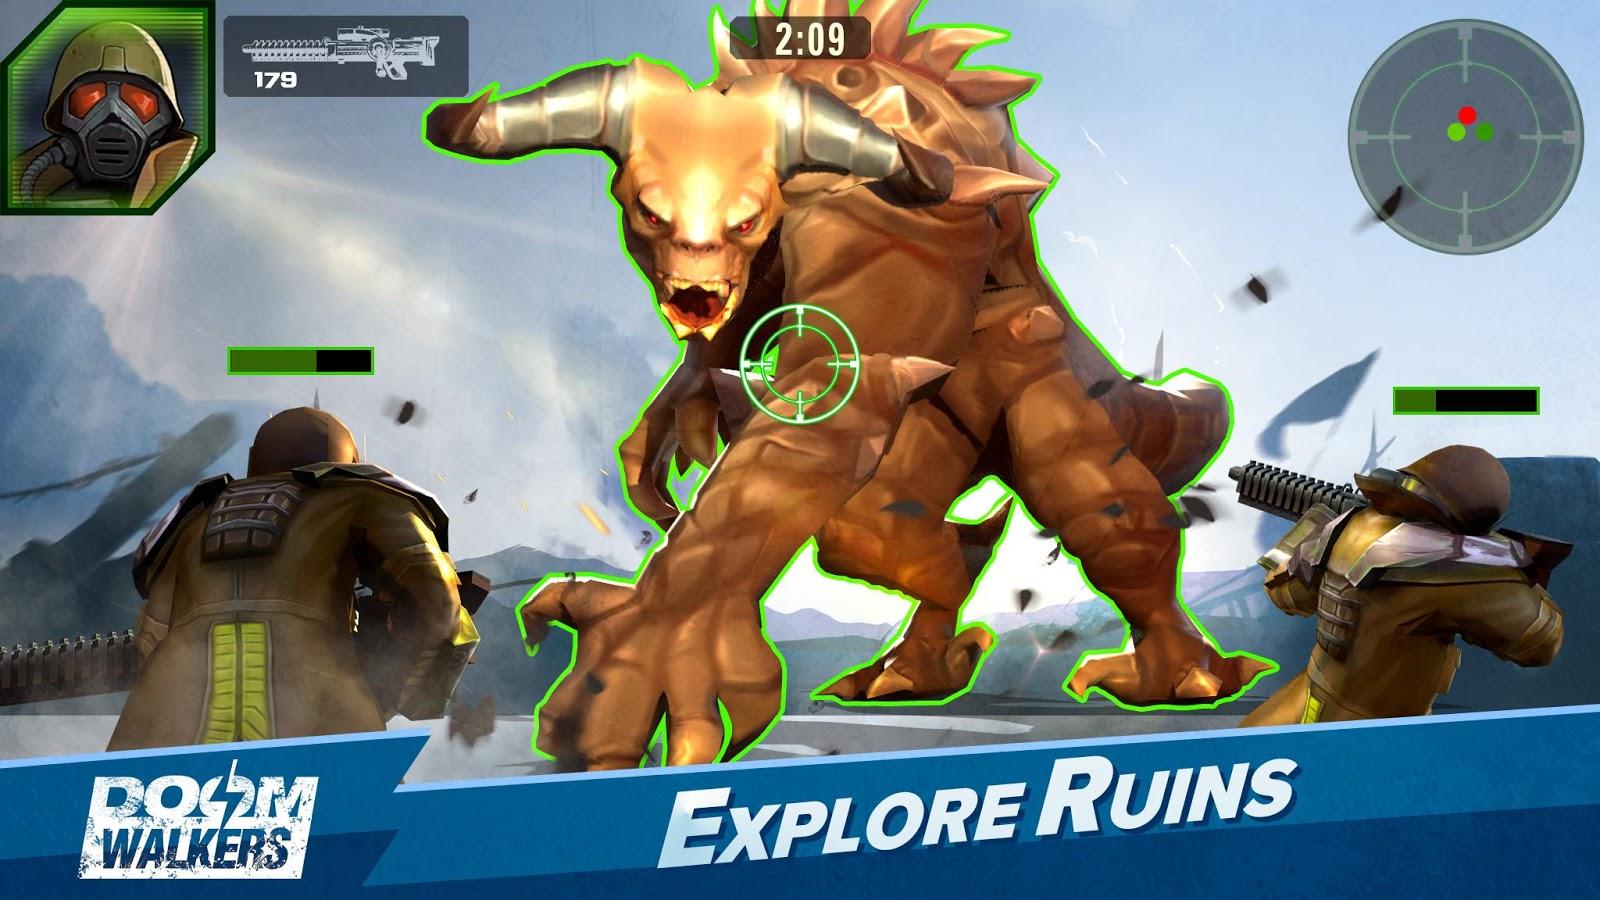 Doomwalker - Wasteland Survivors 5 7 APK Download - Android